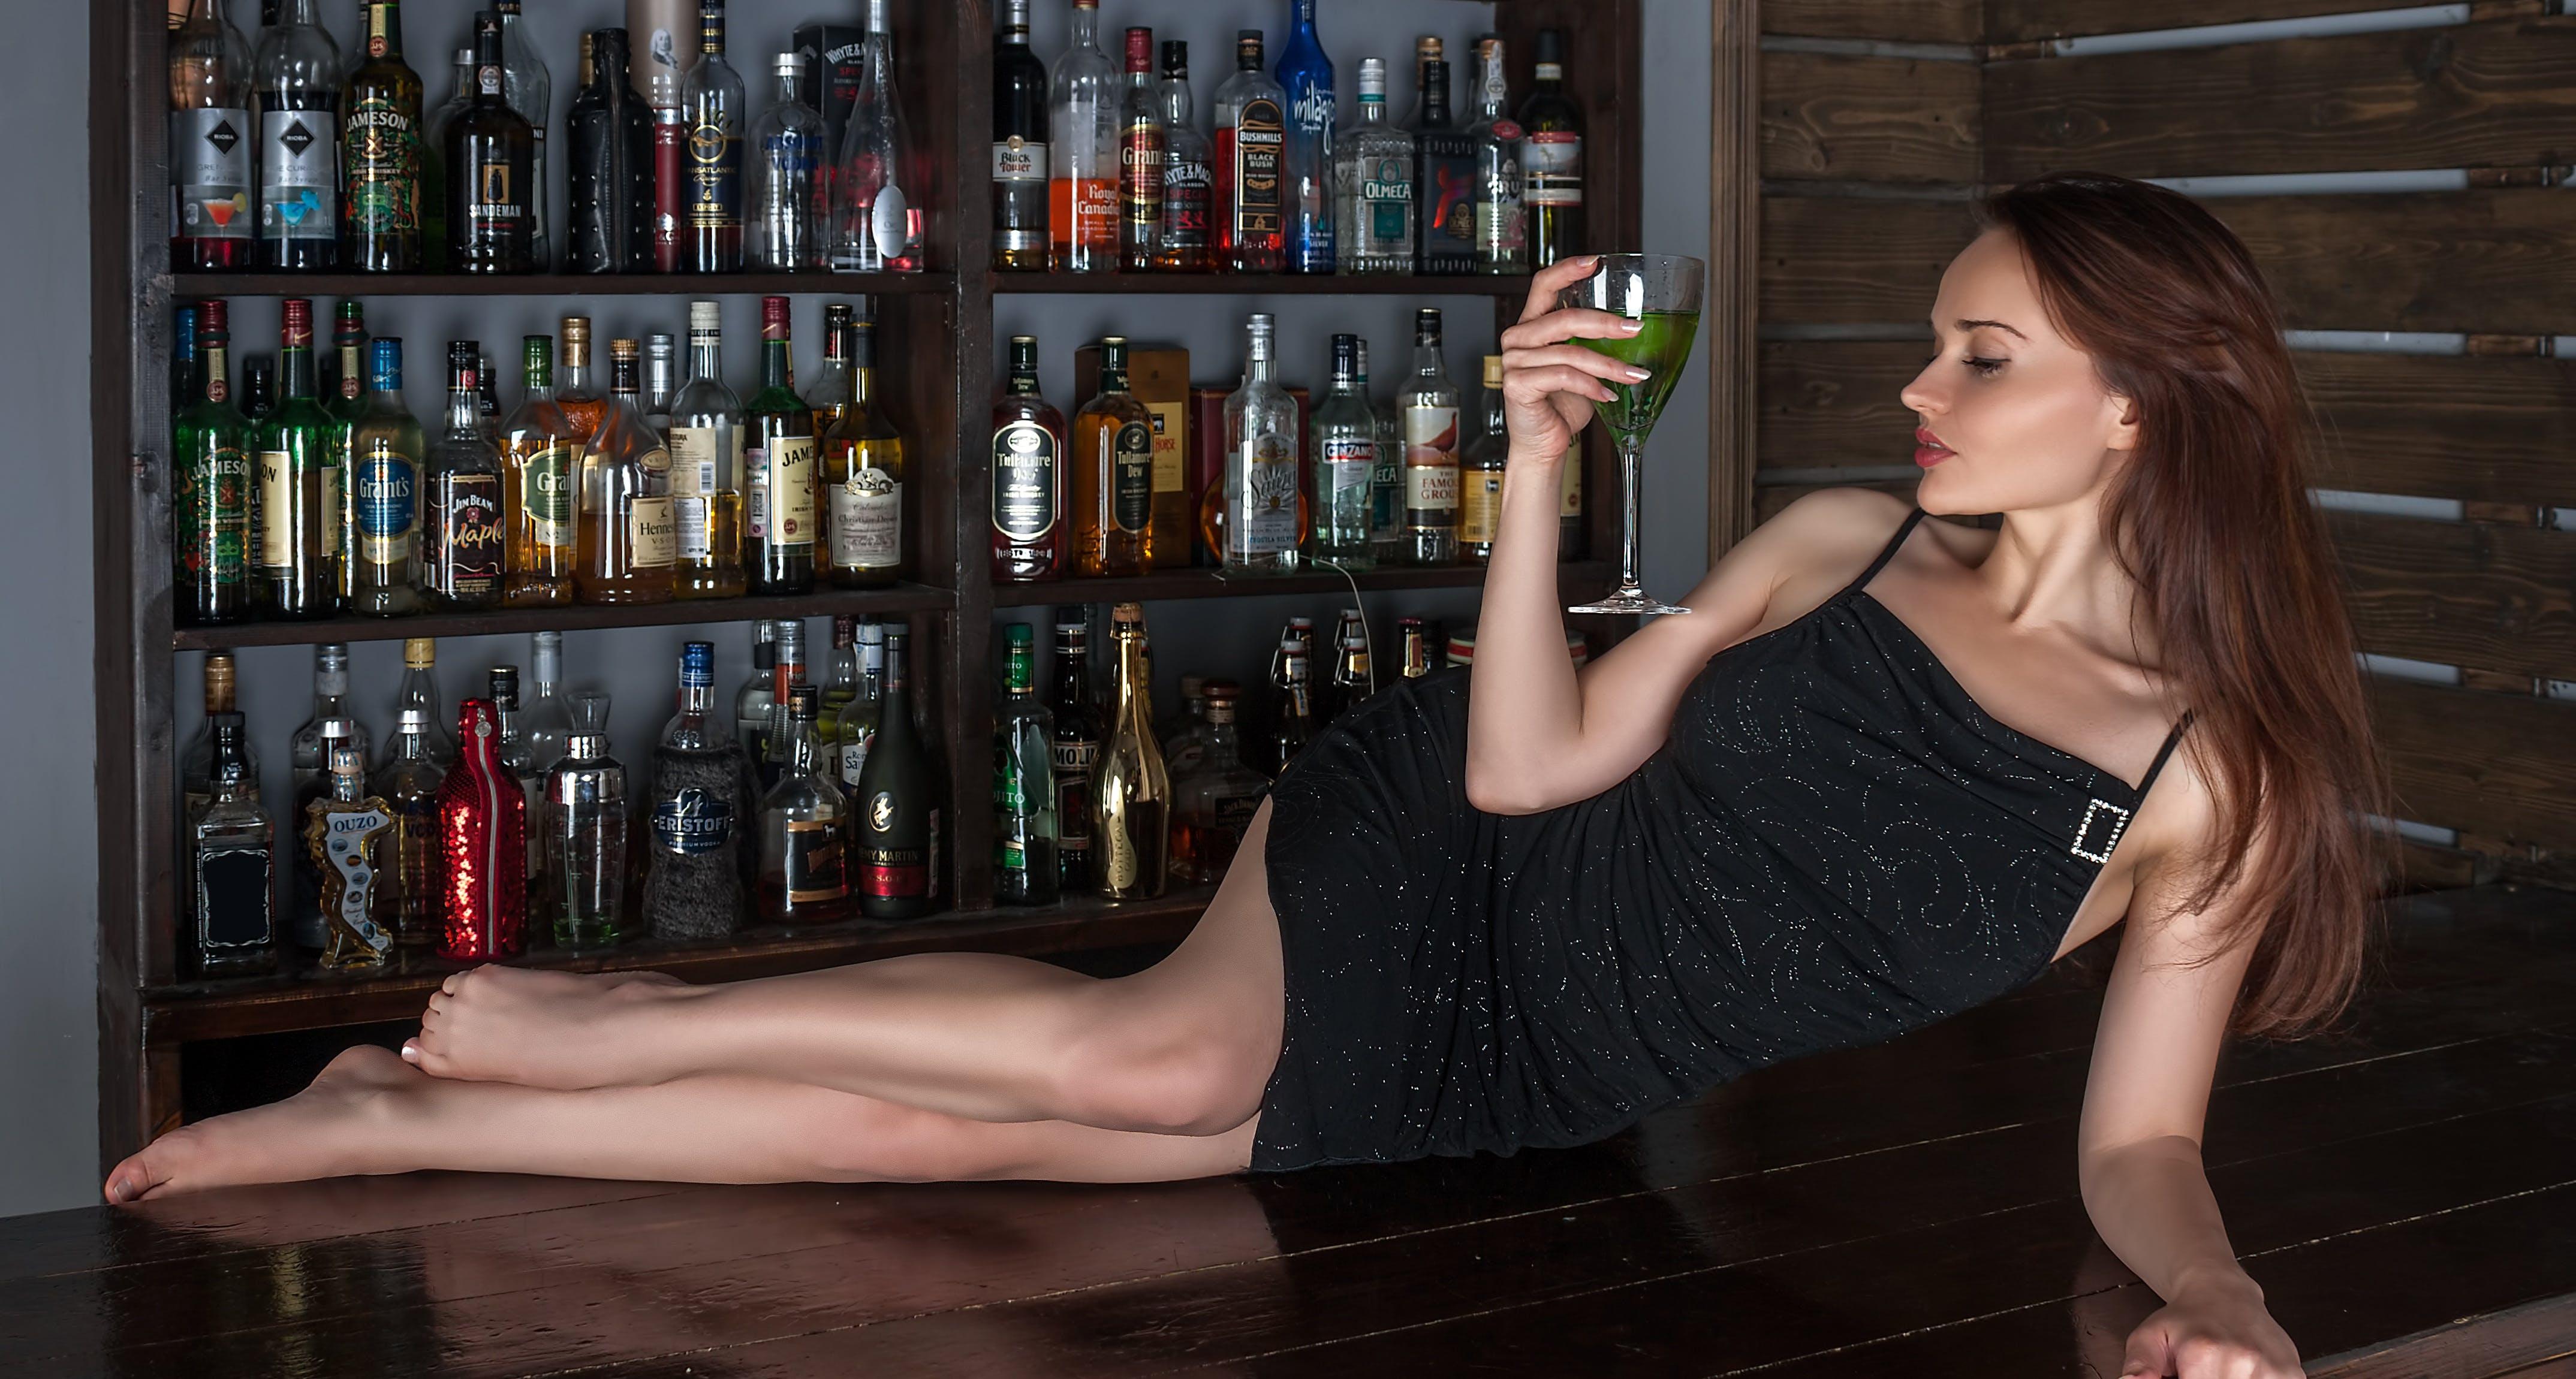 Woman in Black Spaghetti Strap Lying on Desk in Front of Liquor Bottles